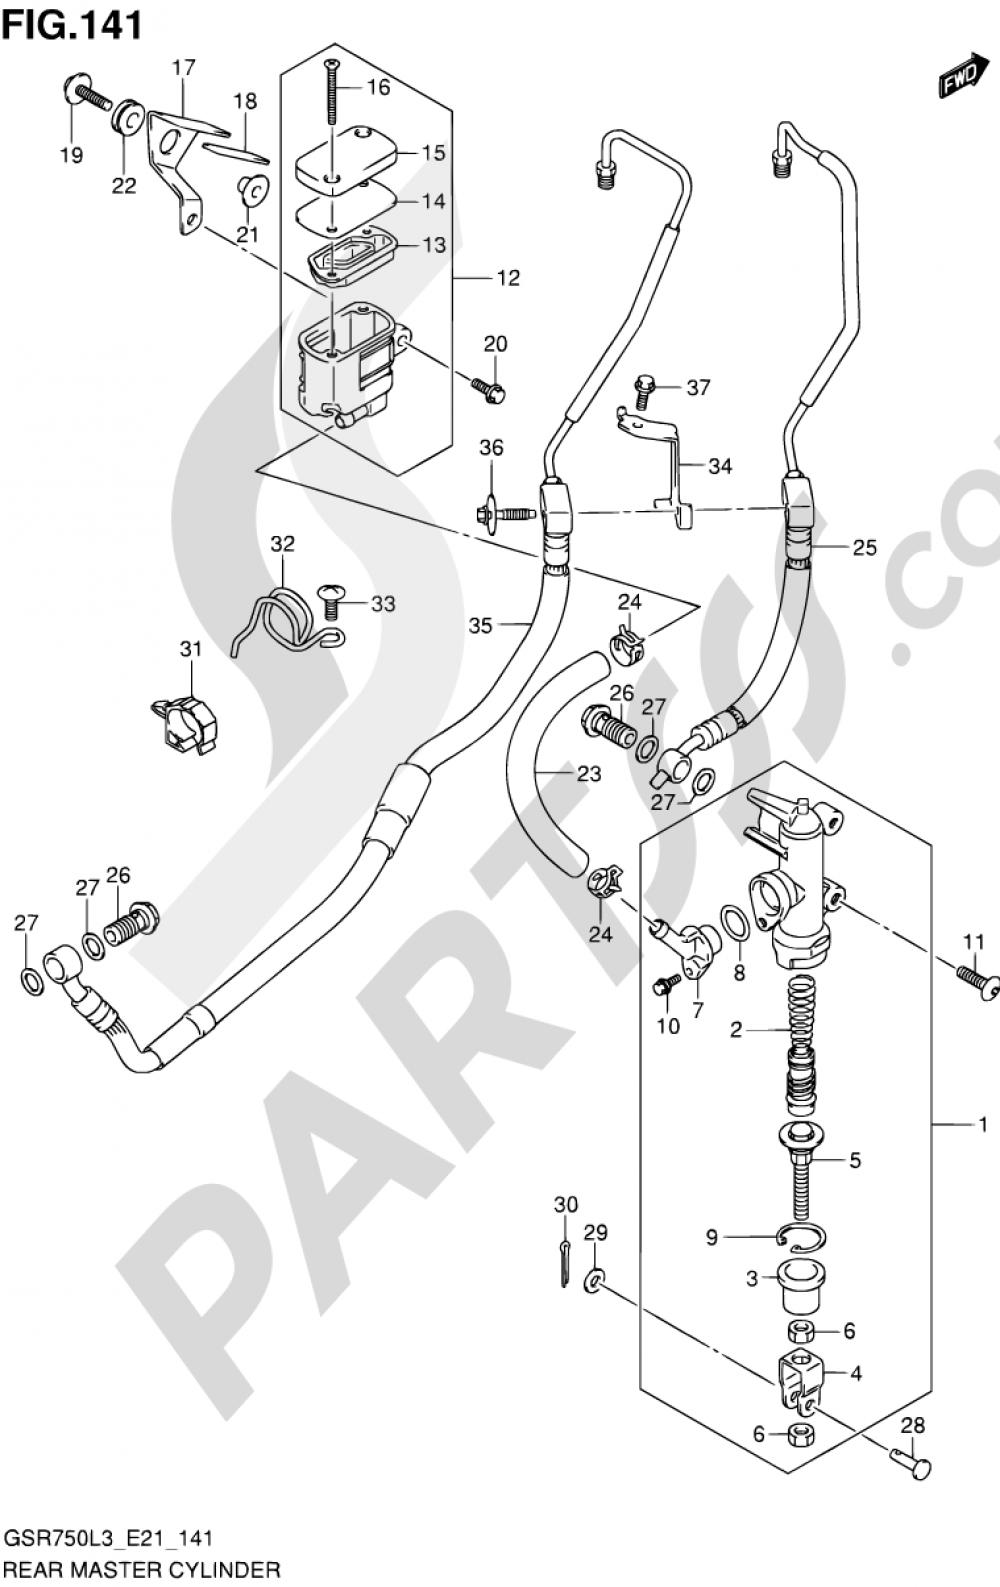 141 - REAR MASTER CYLINDER (GSR750AL3 E21) Suzuki GSR750A 2013